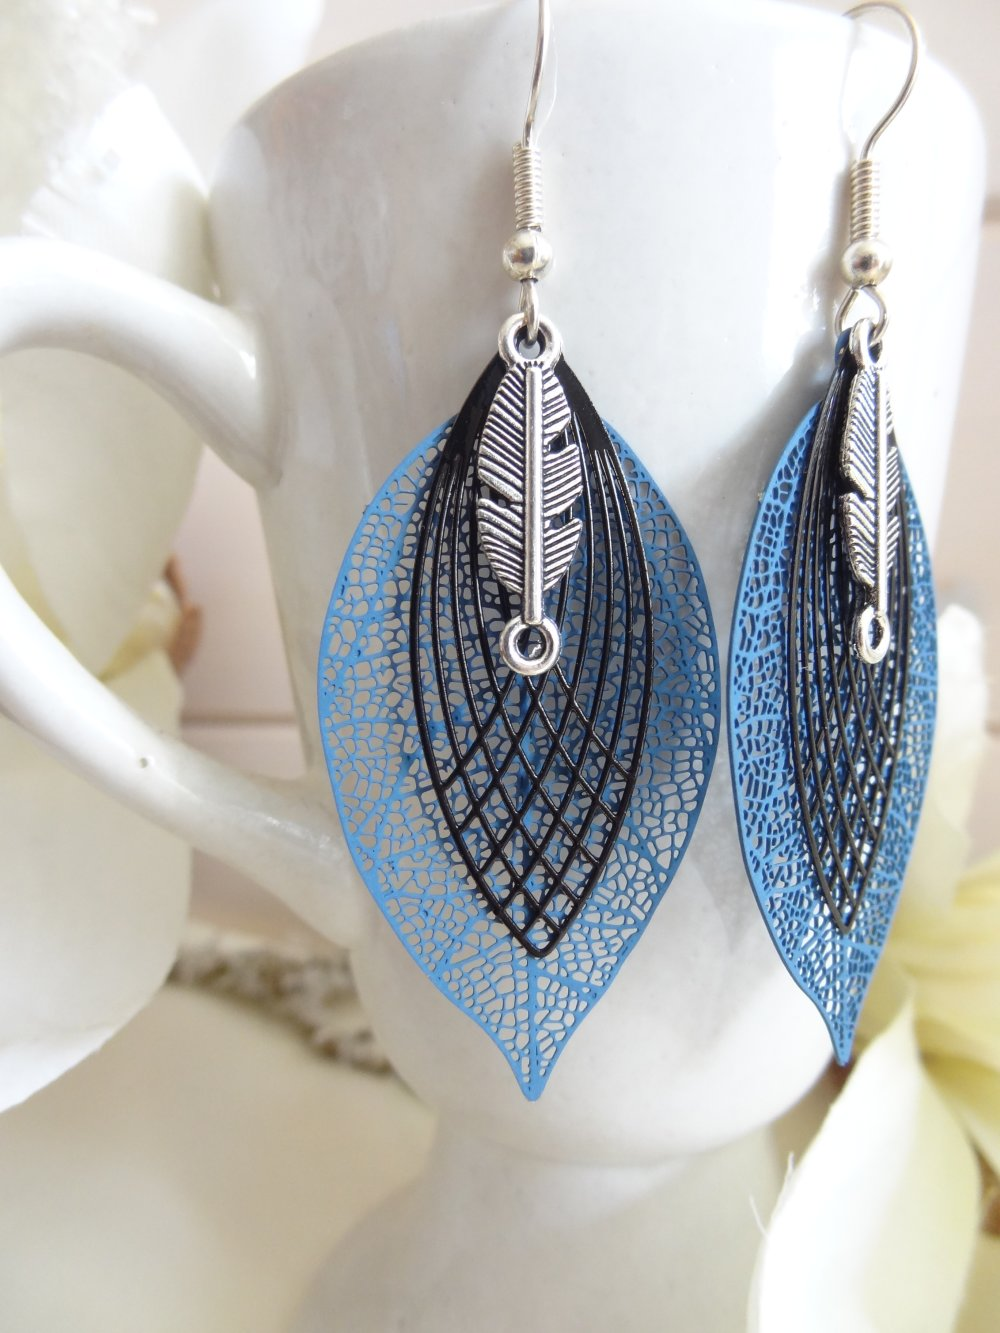 boucles d'oreilles pendantes fantaisie feuille bleu marine